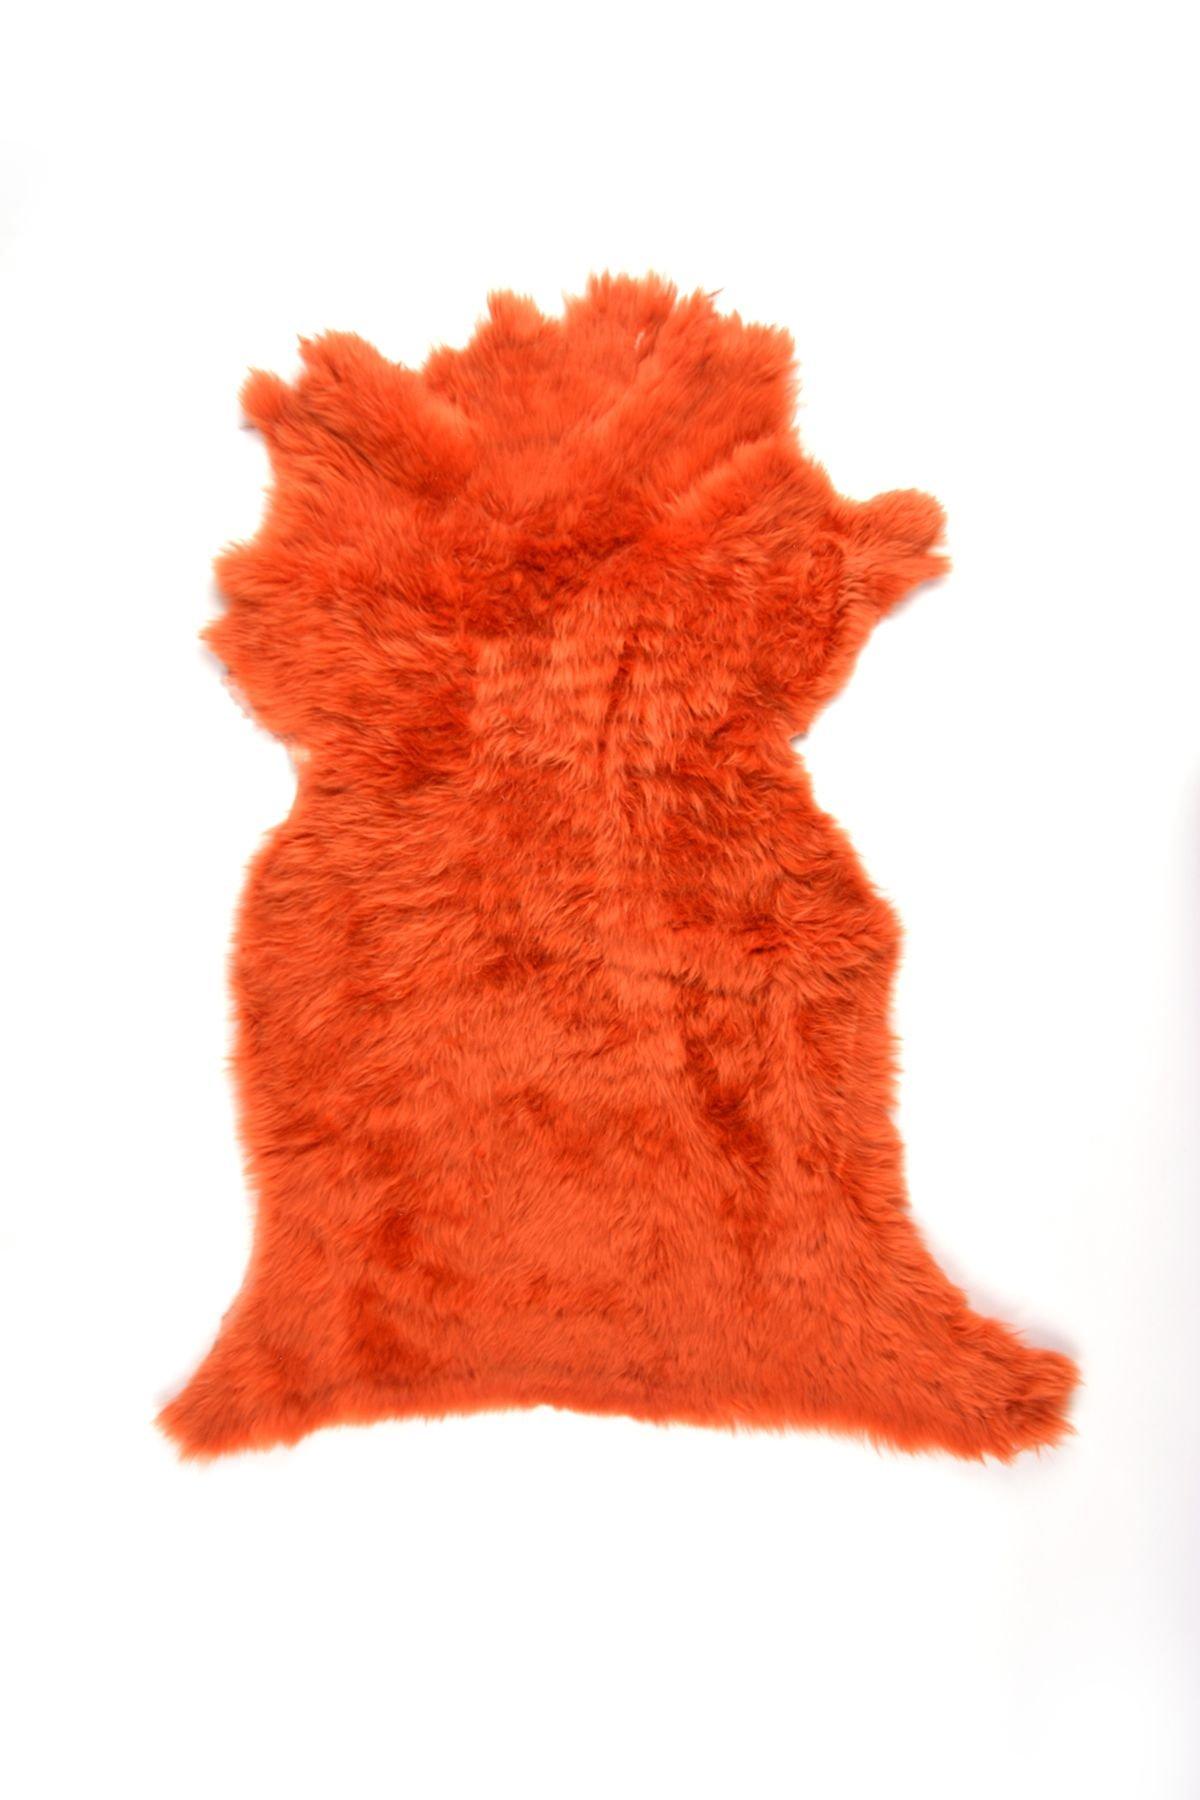 Erdogan Deri Decorative Sheepskin Rug Orange